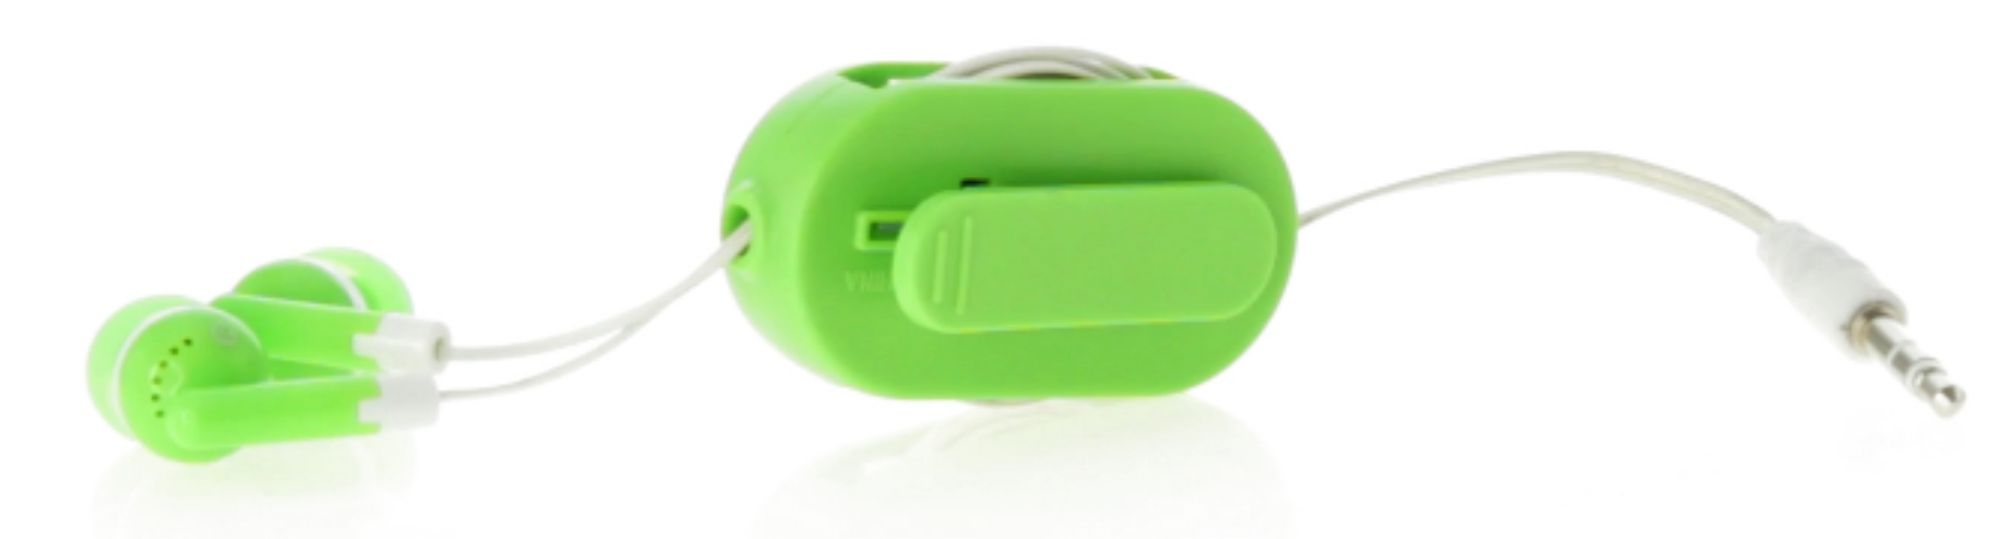 наушники со светоотражателем и держателем RASUM